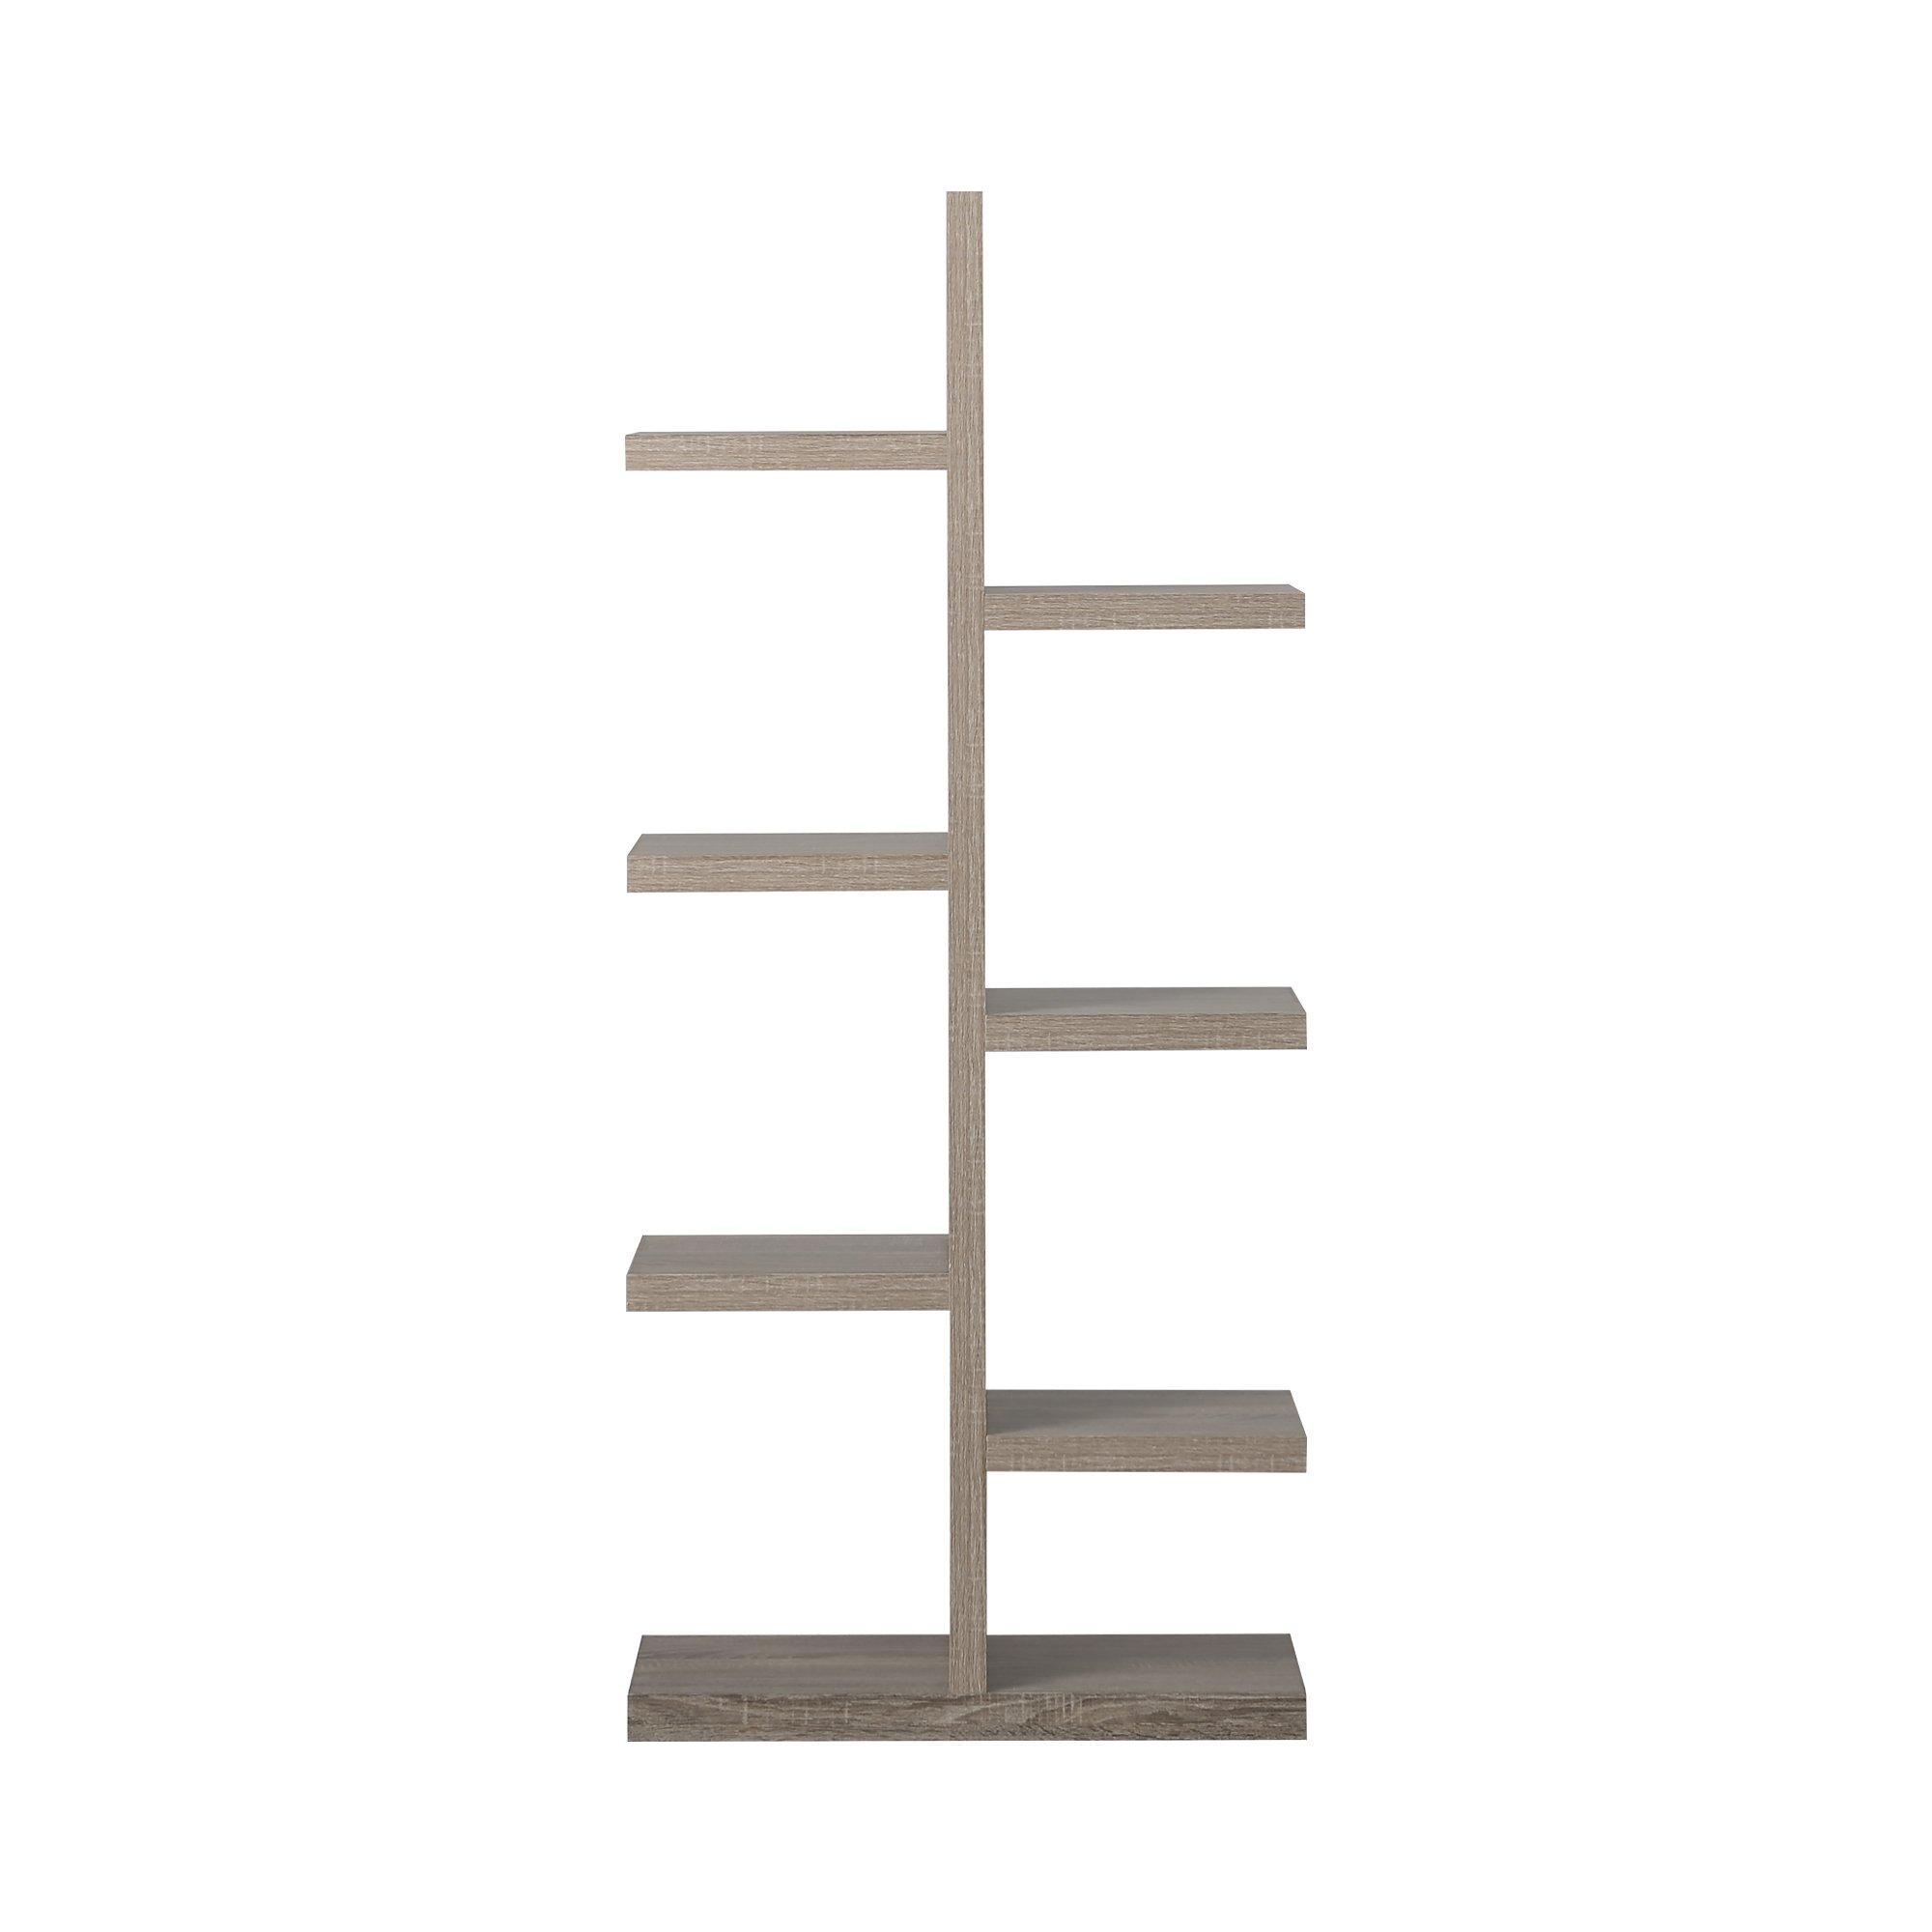 Homestar 7-Shelf Bookcase in Reclaimed Wood